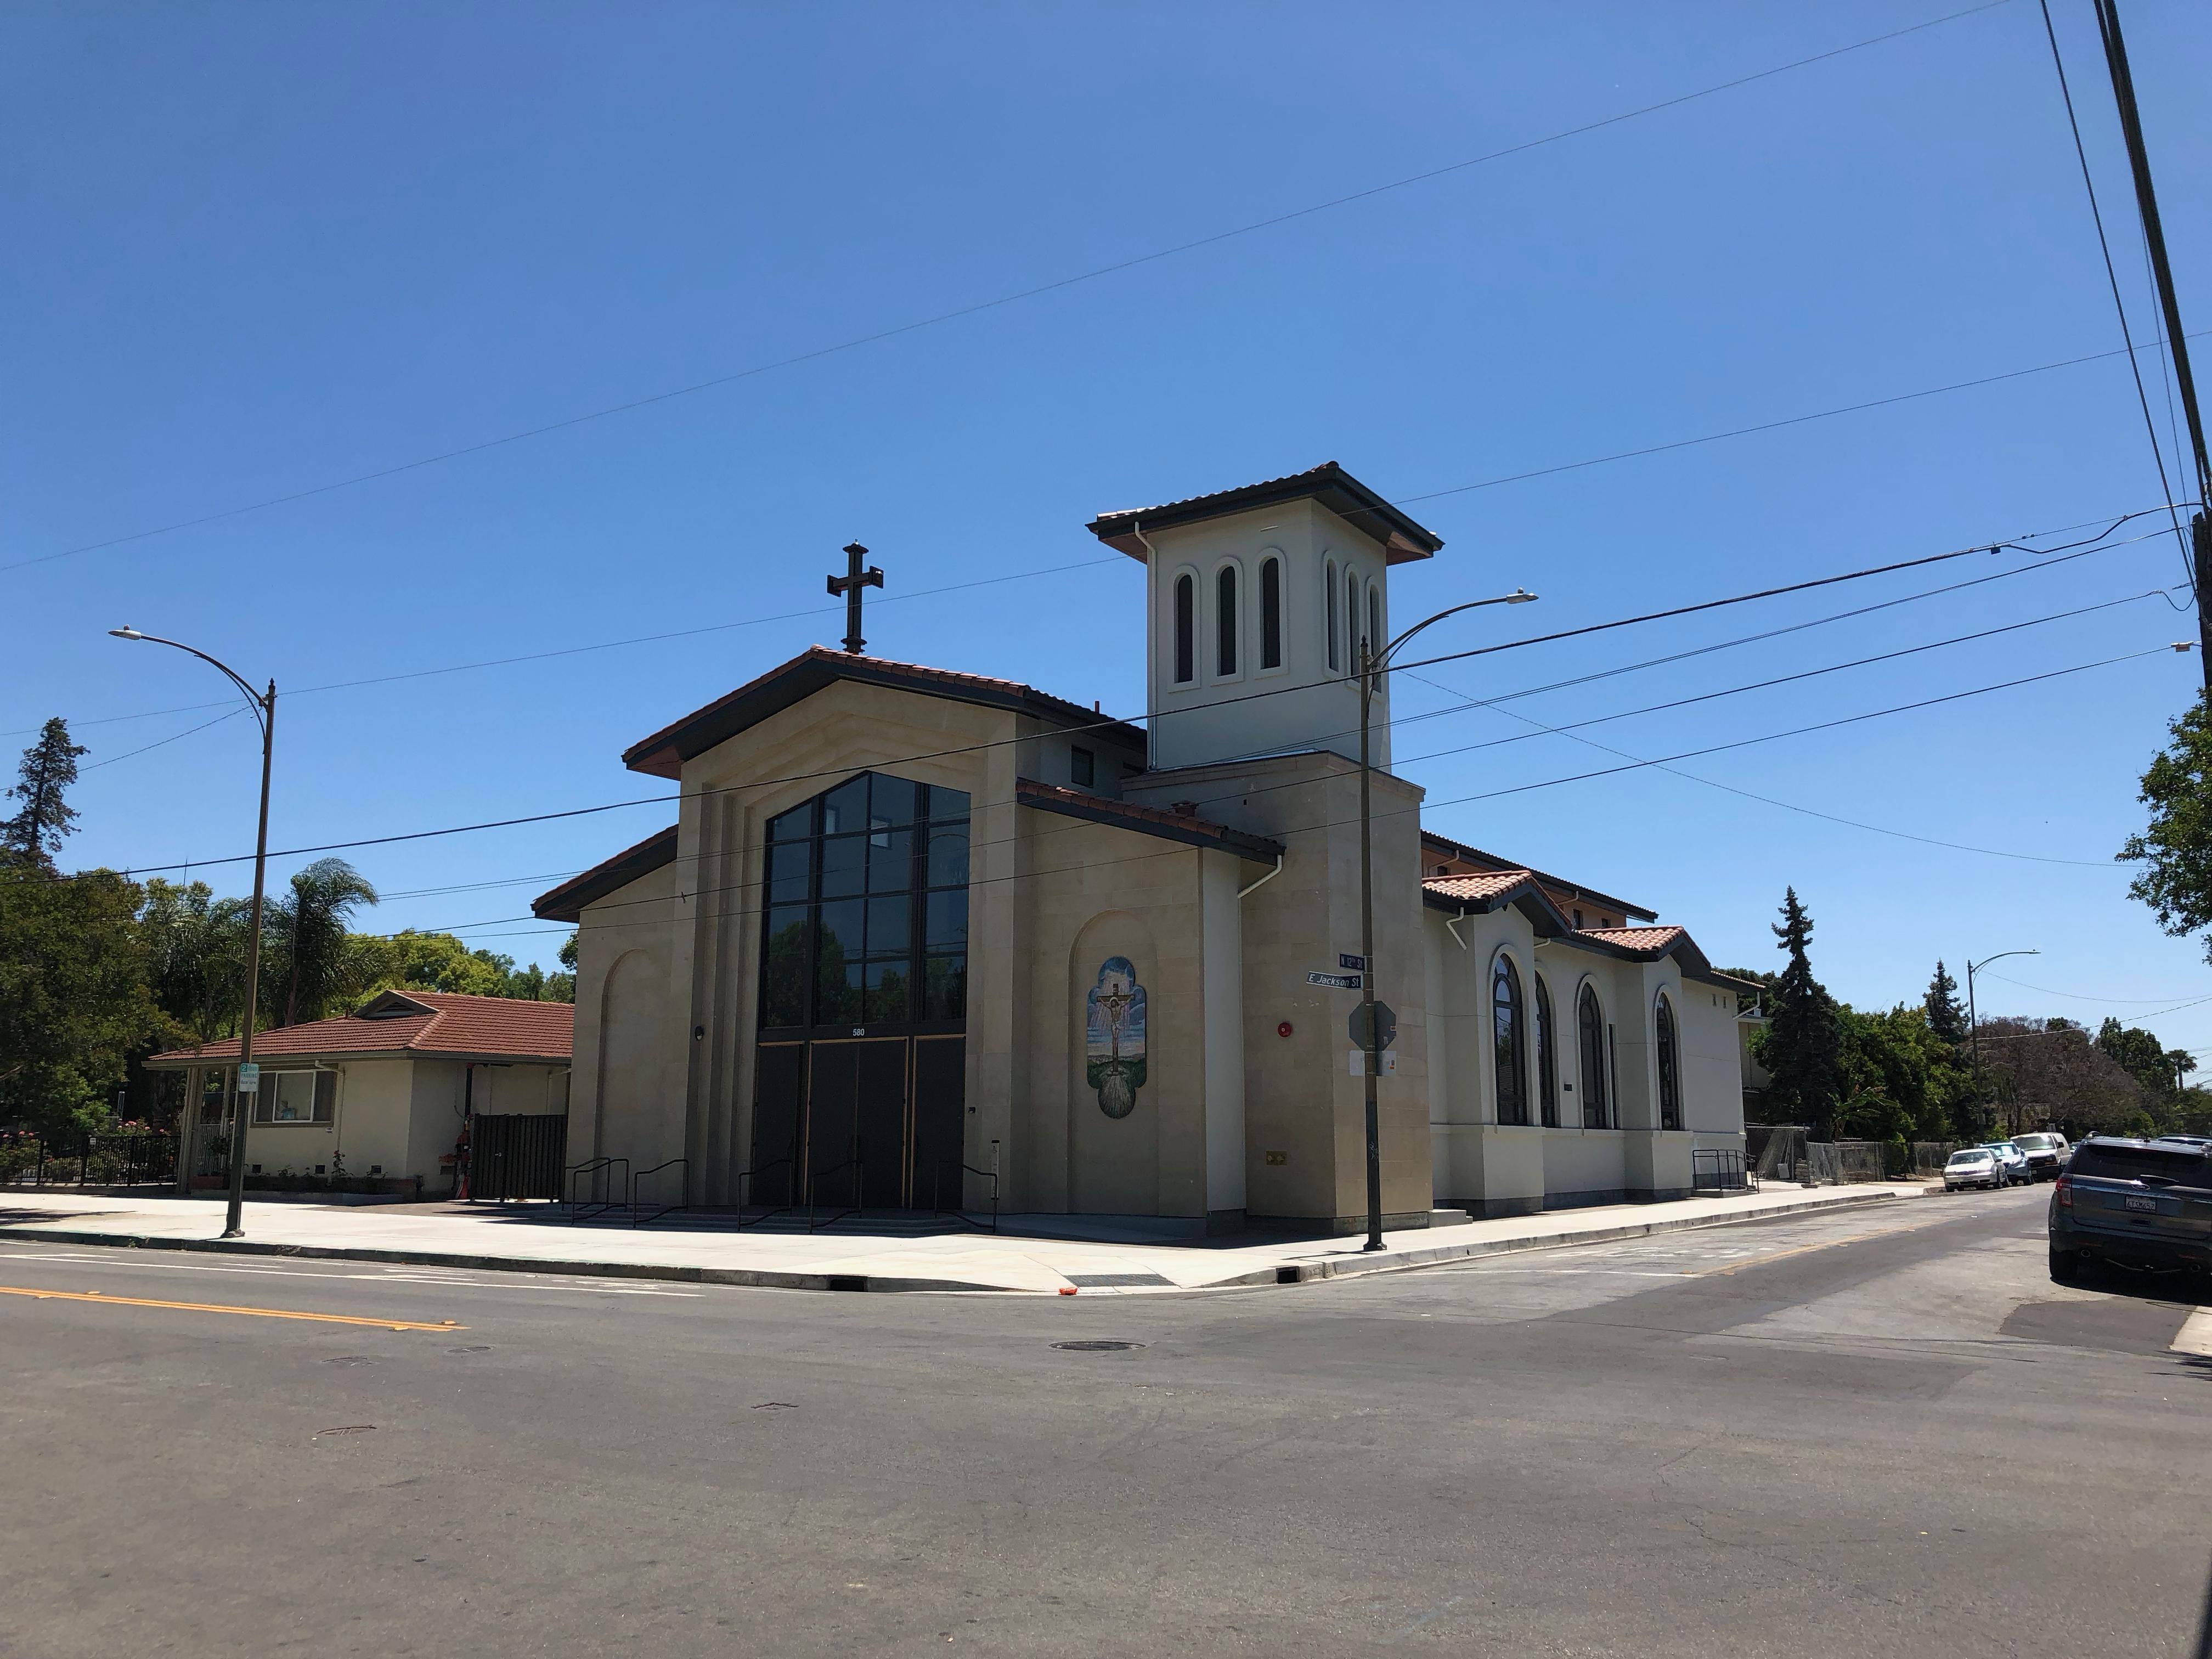 Holy Cross Church (San Jose, California) - Wikipedia